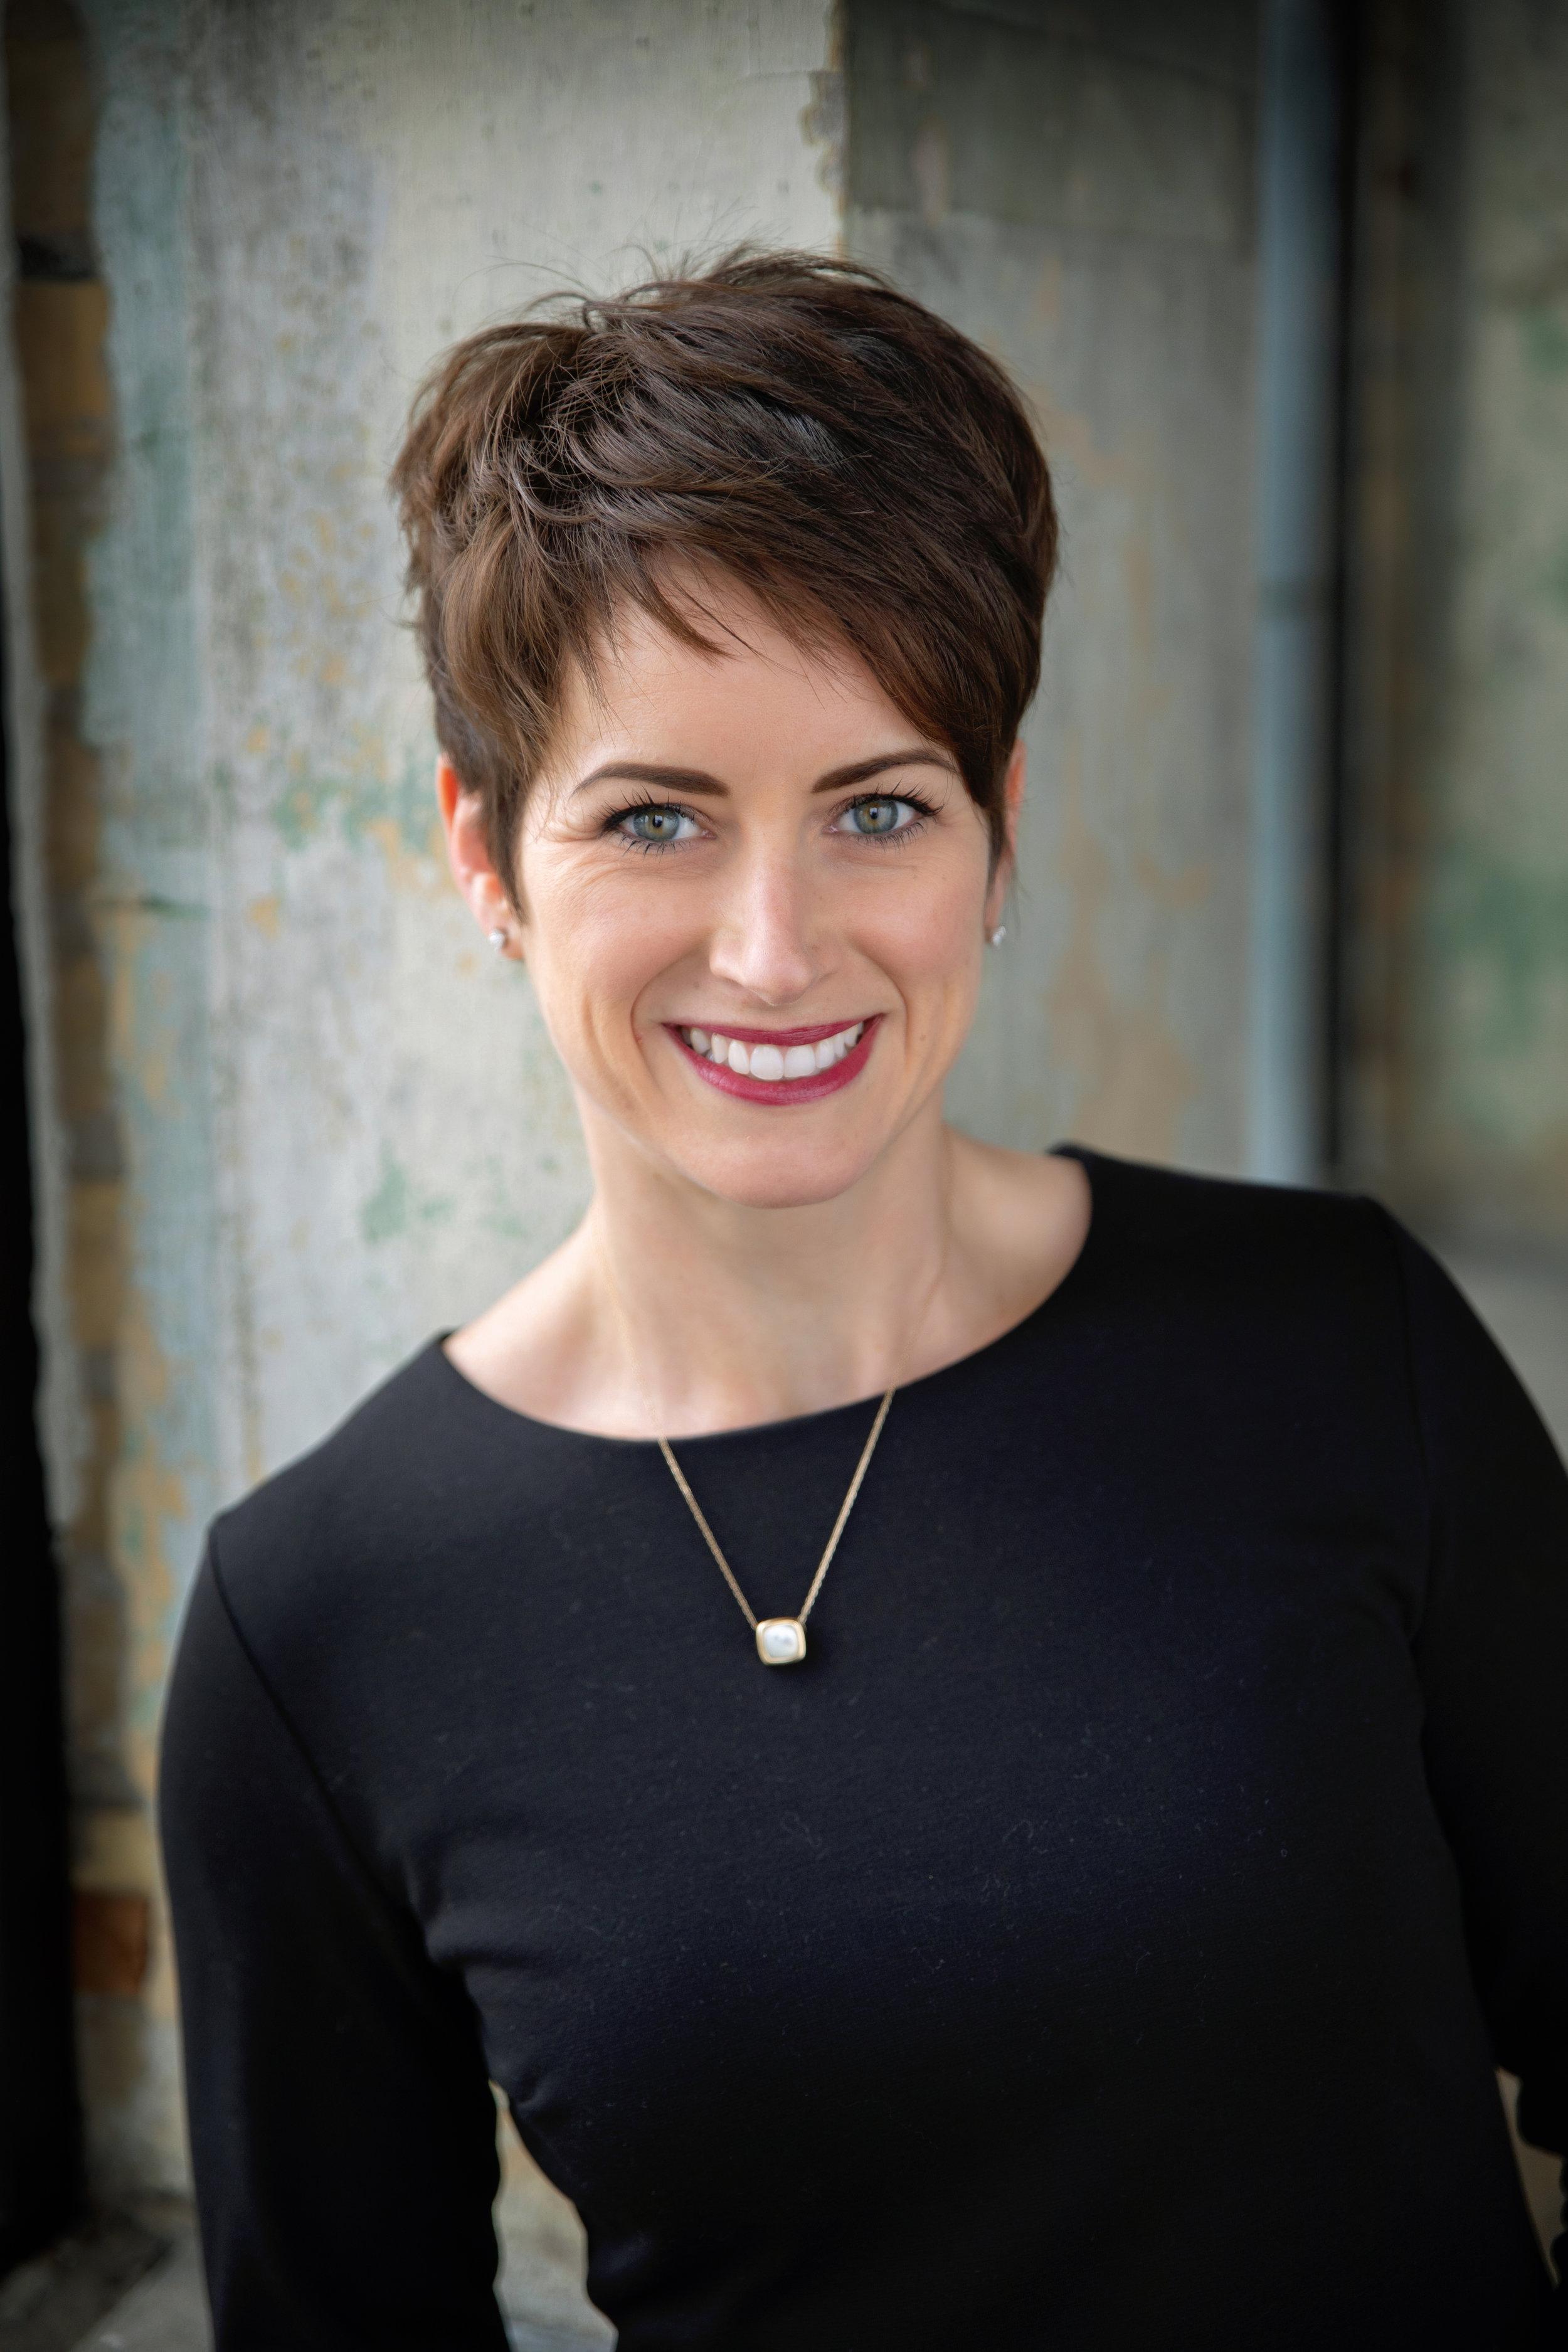 Kate damato - Broker Associate